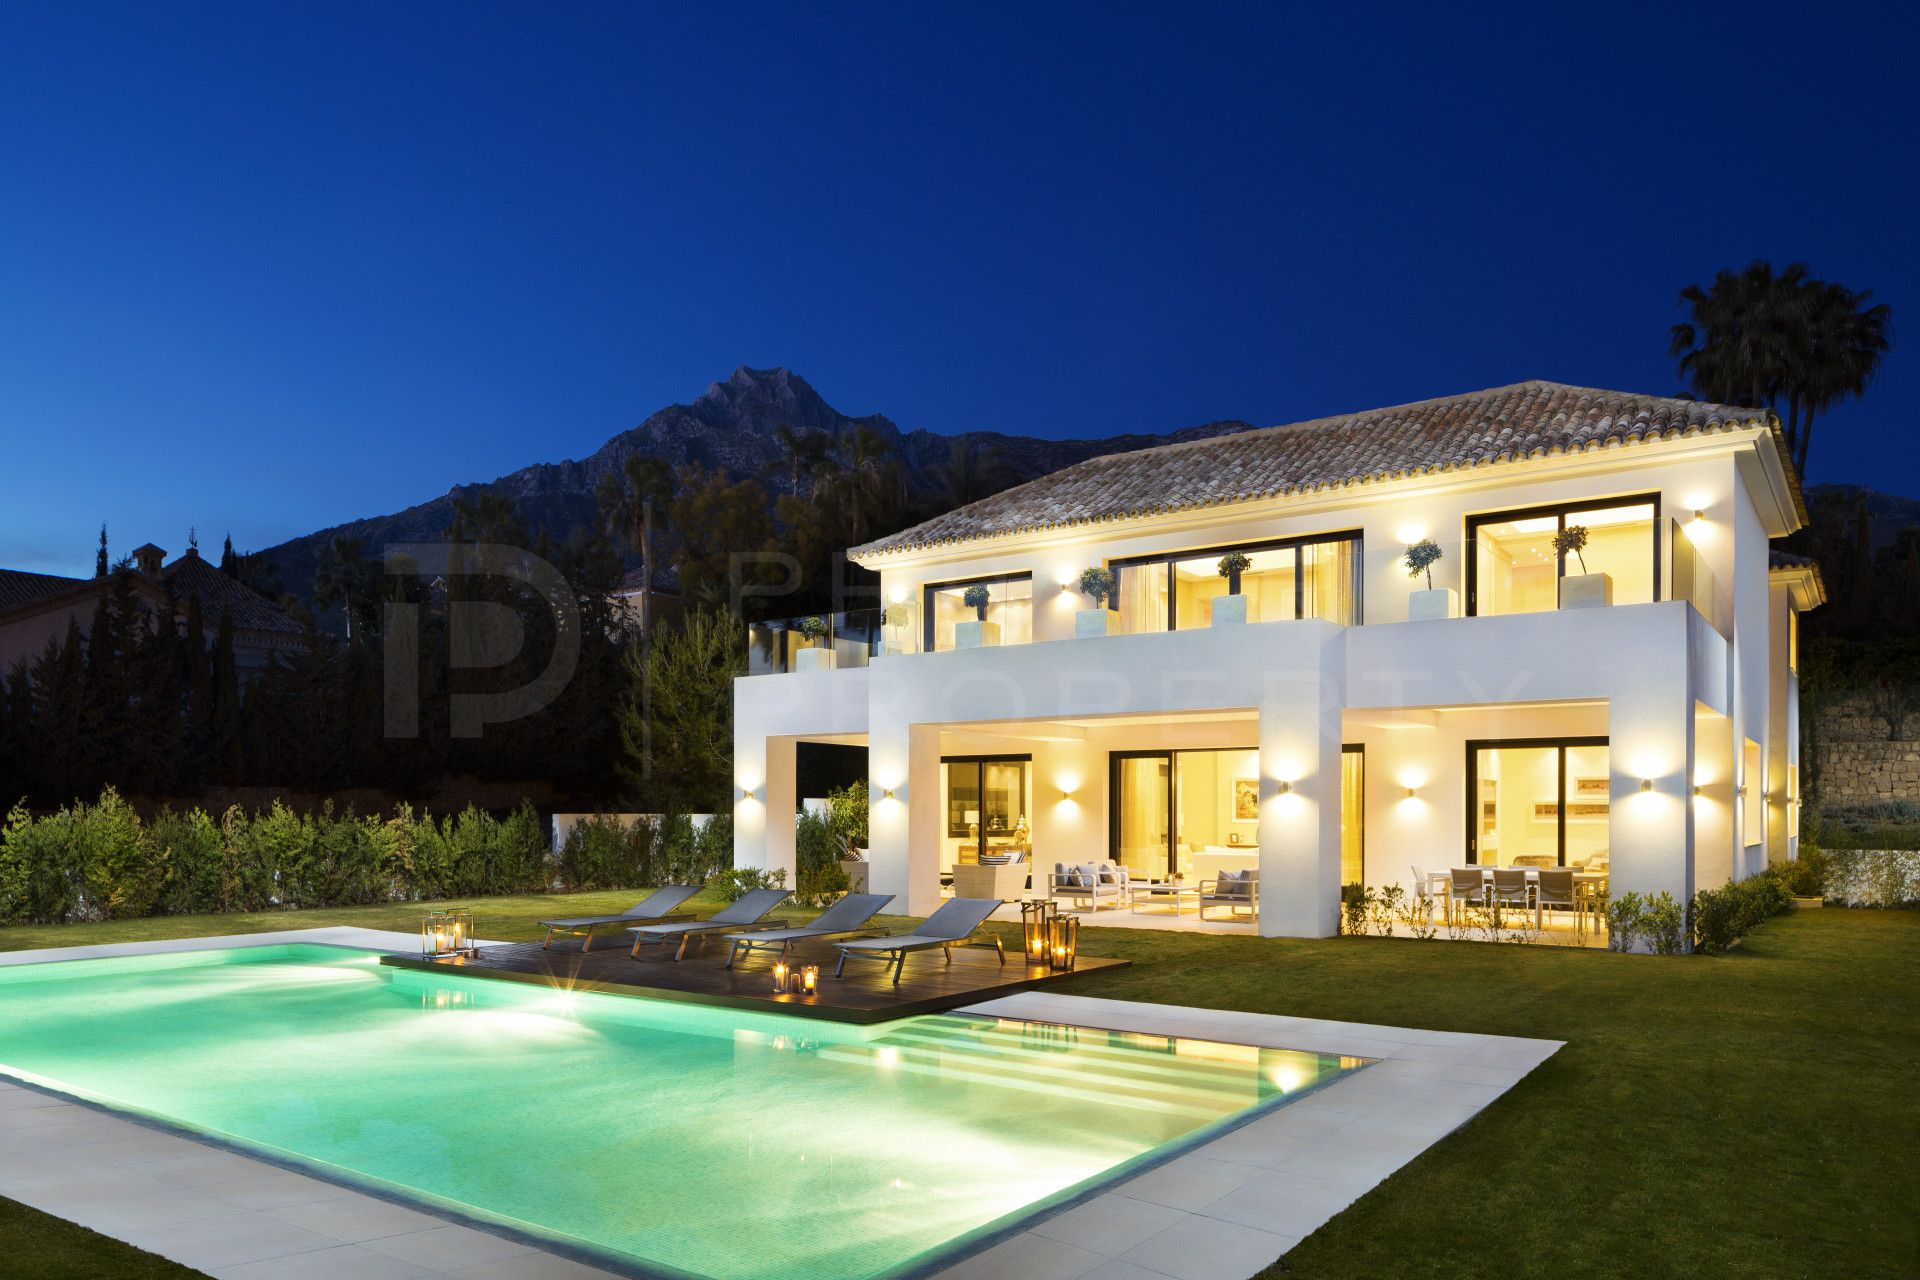 Immaculate villa in Sierra Blanca